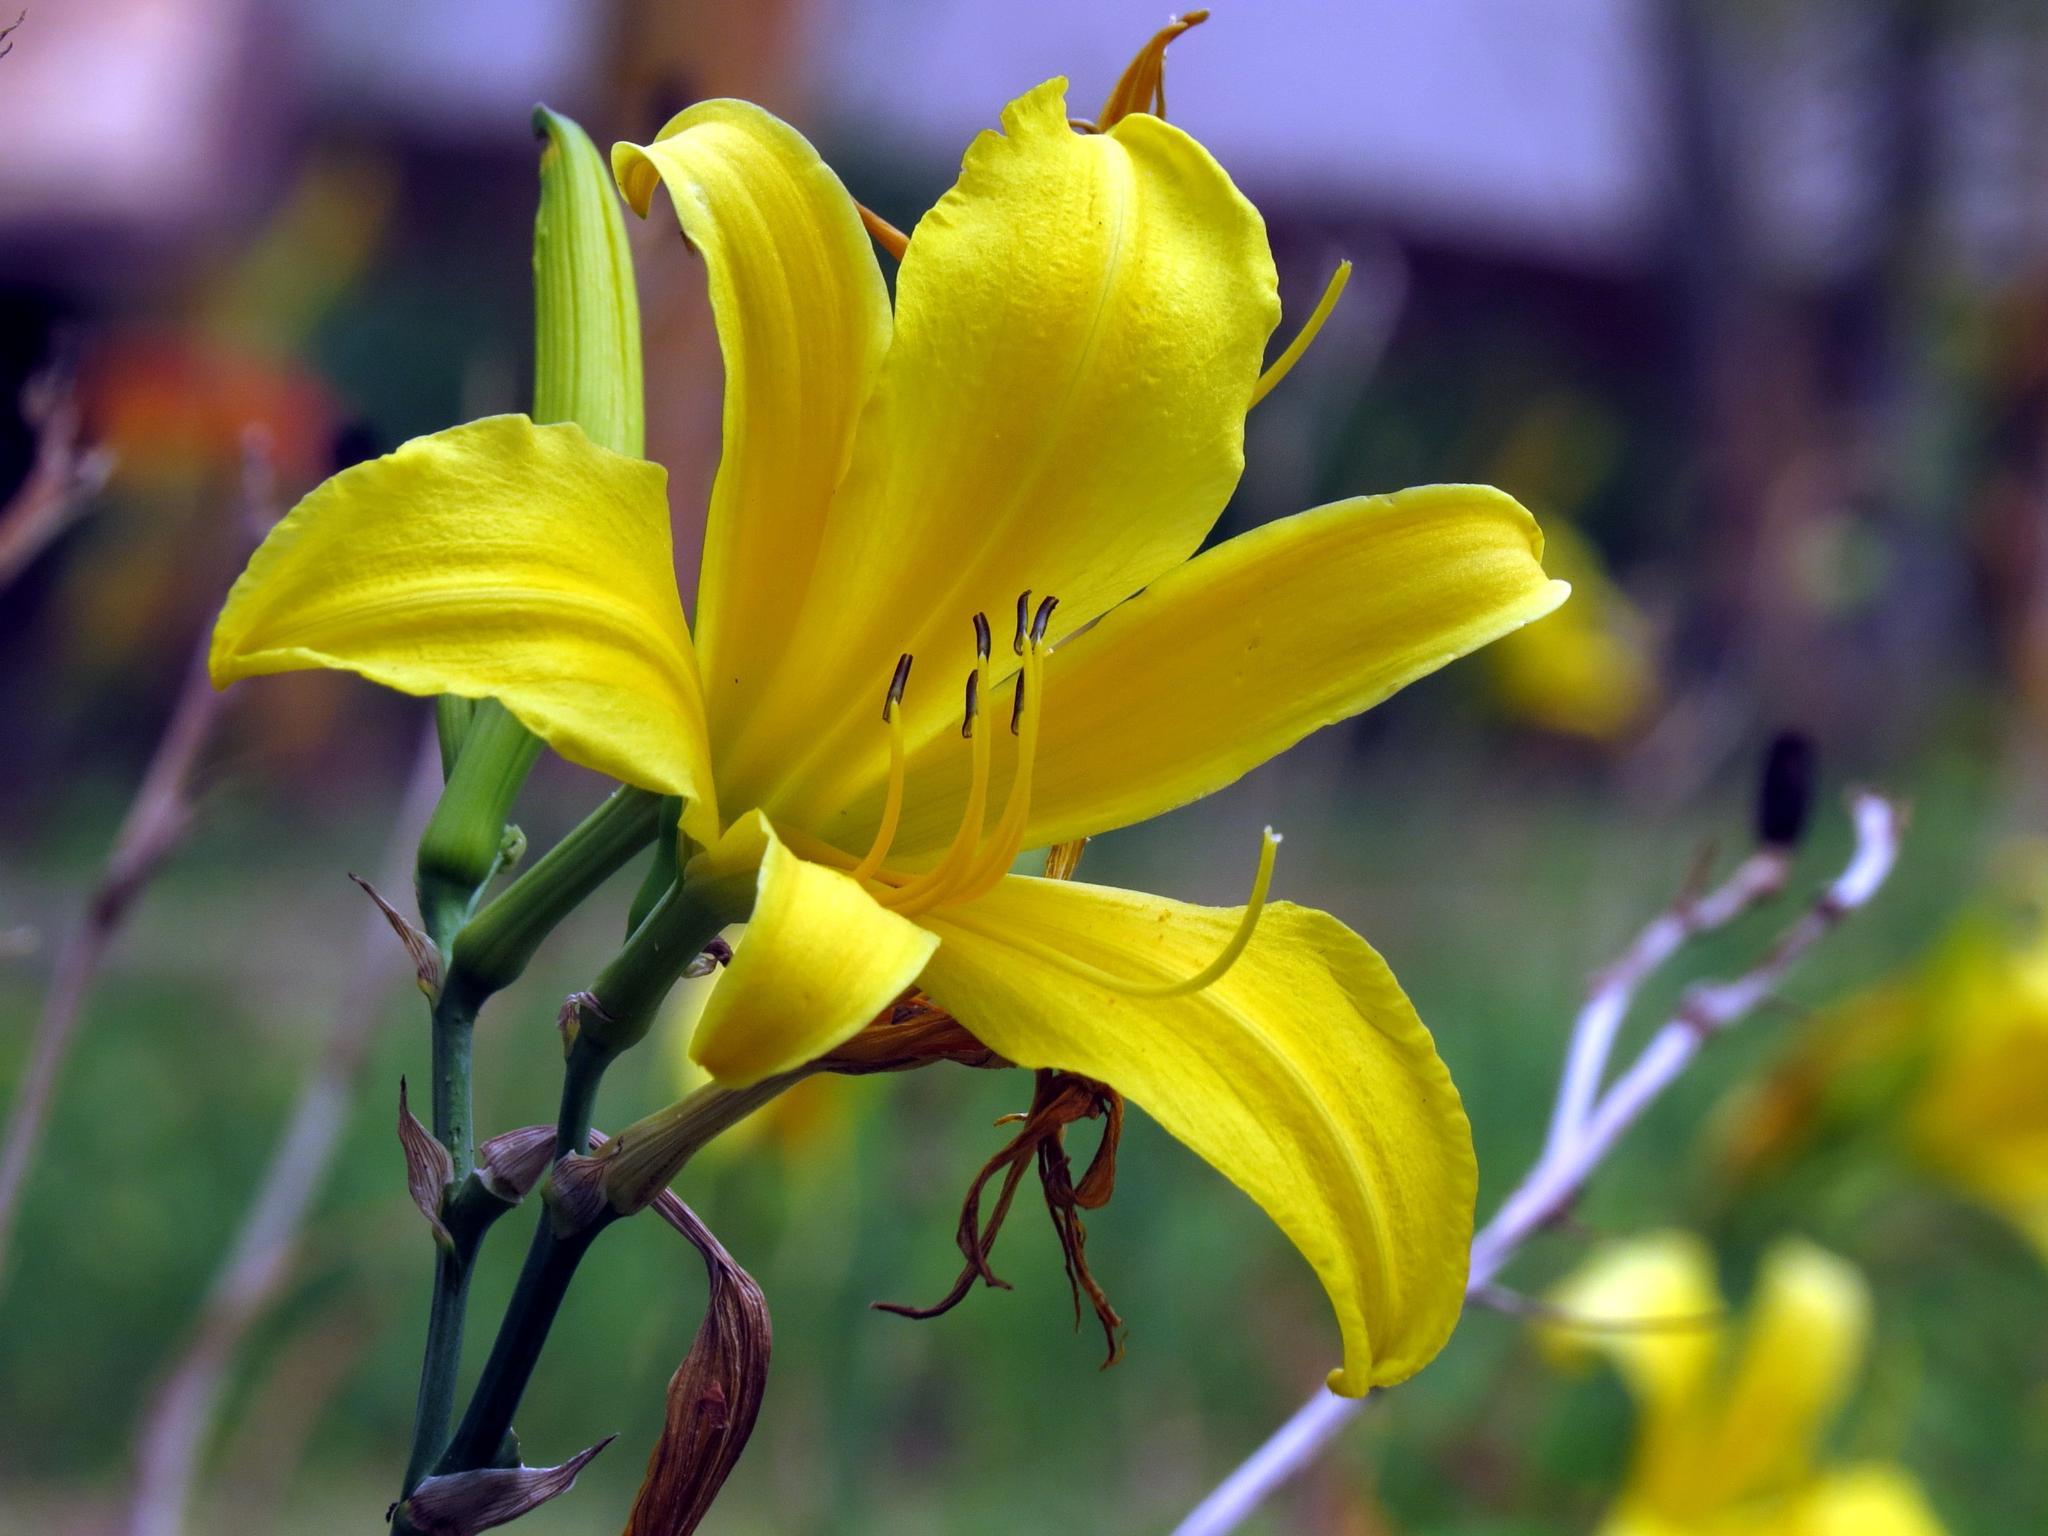 Flor do Belvedere by luismarcio